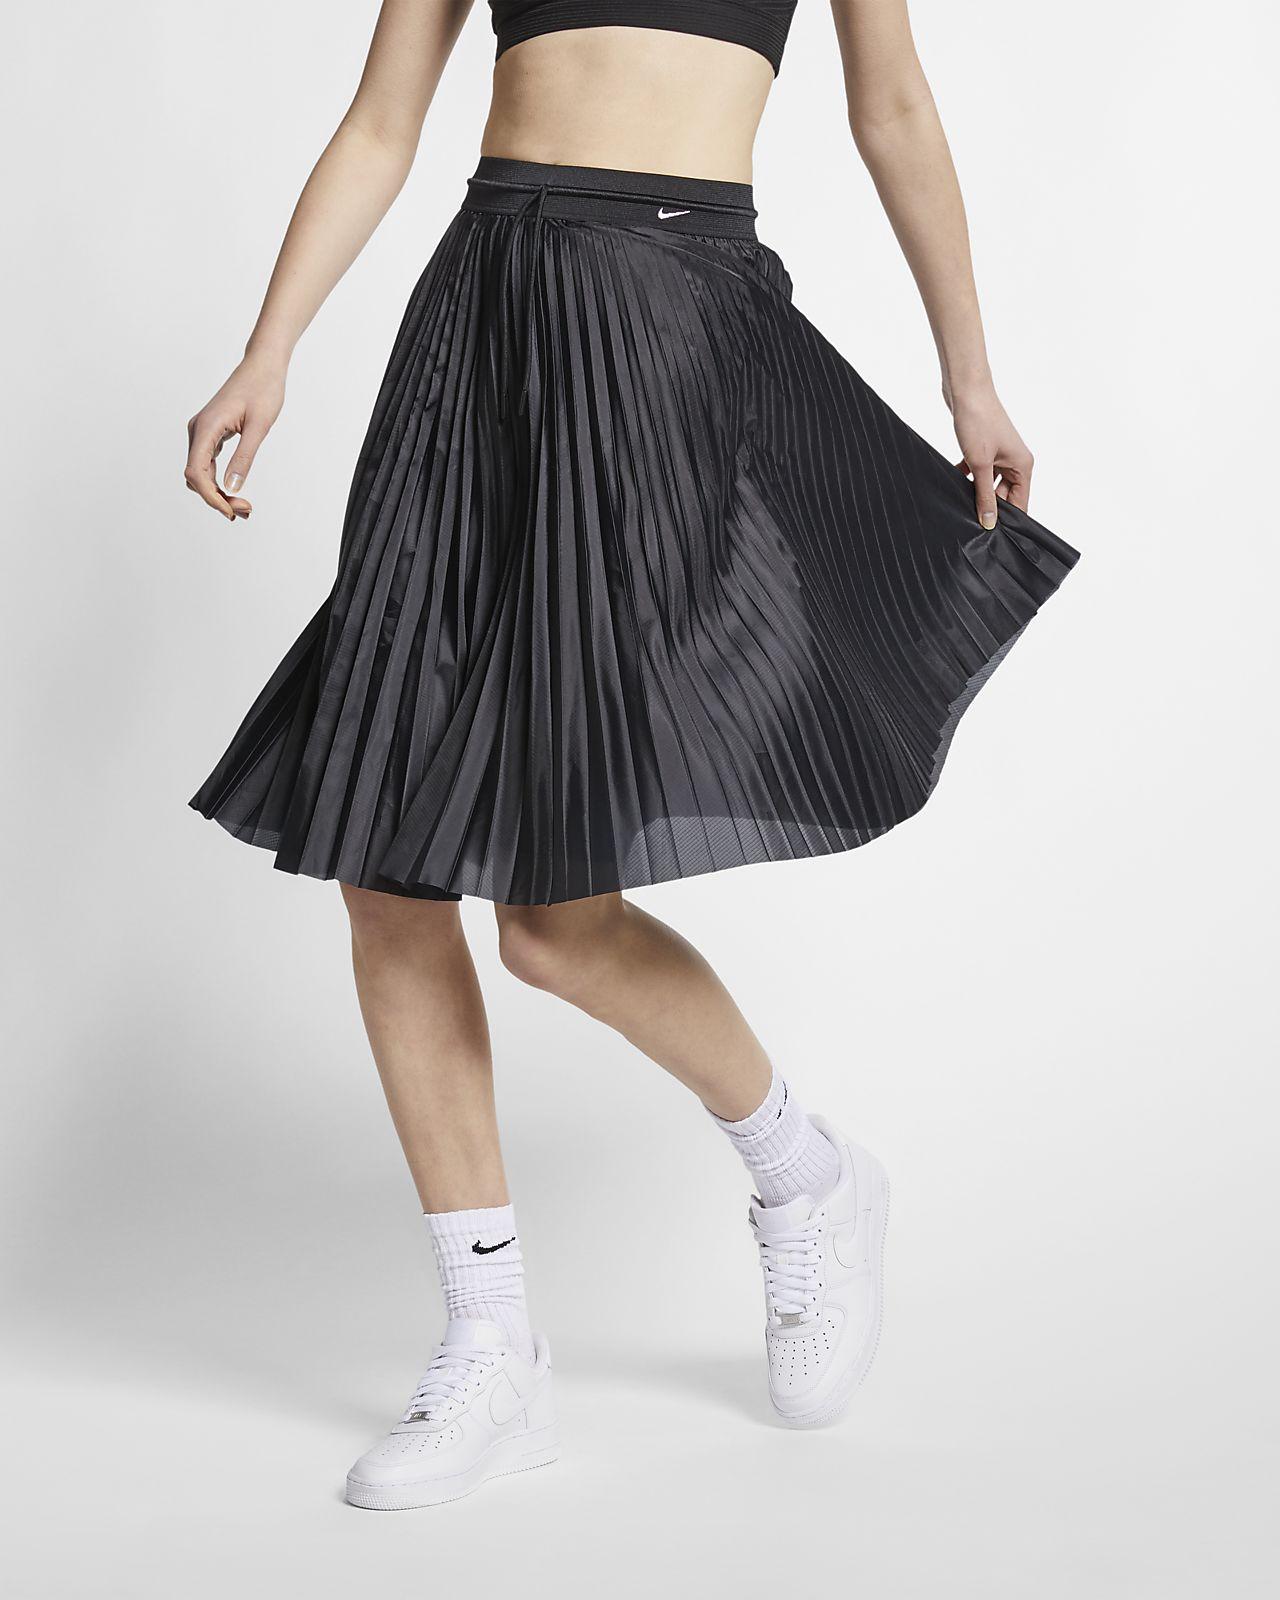 NikeLab Collection Women's Skirt